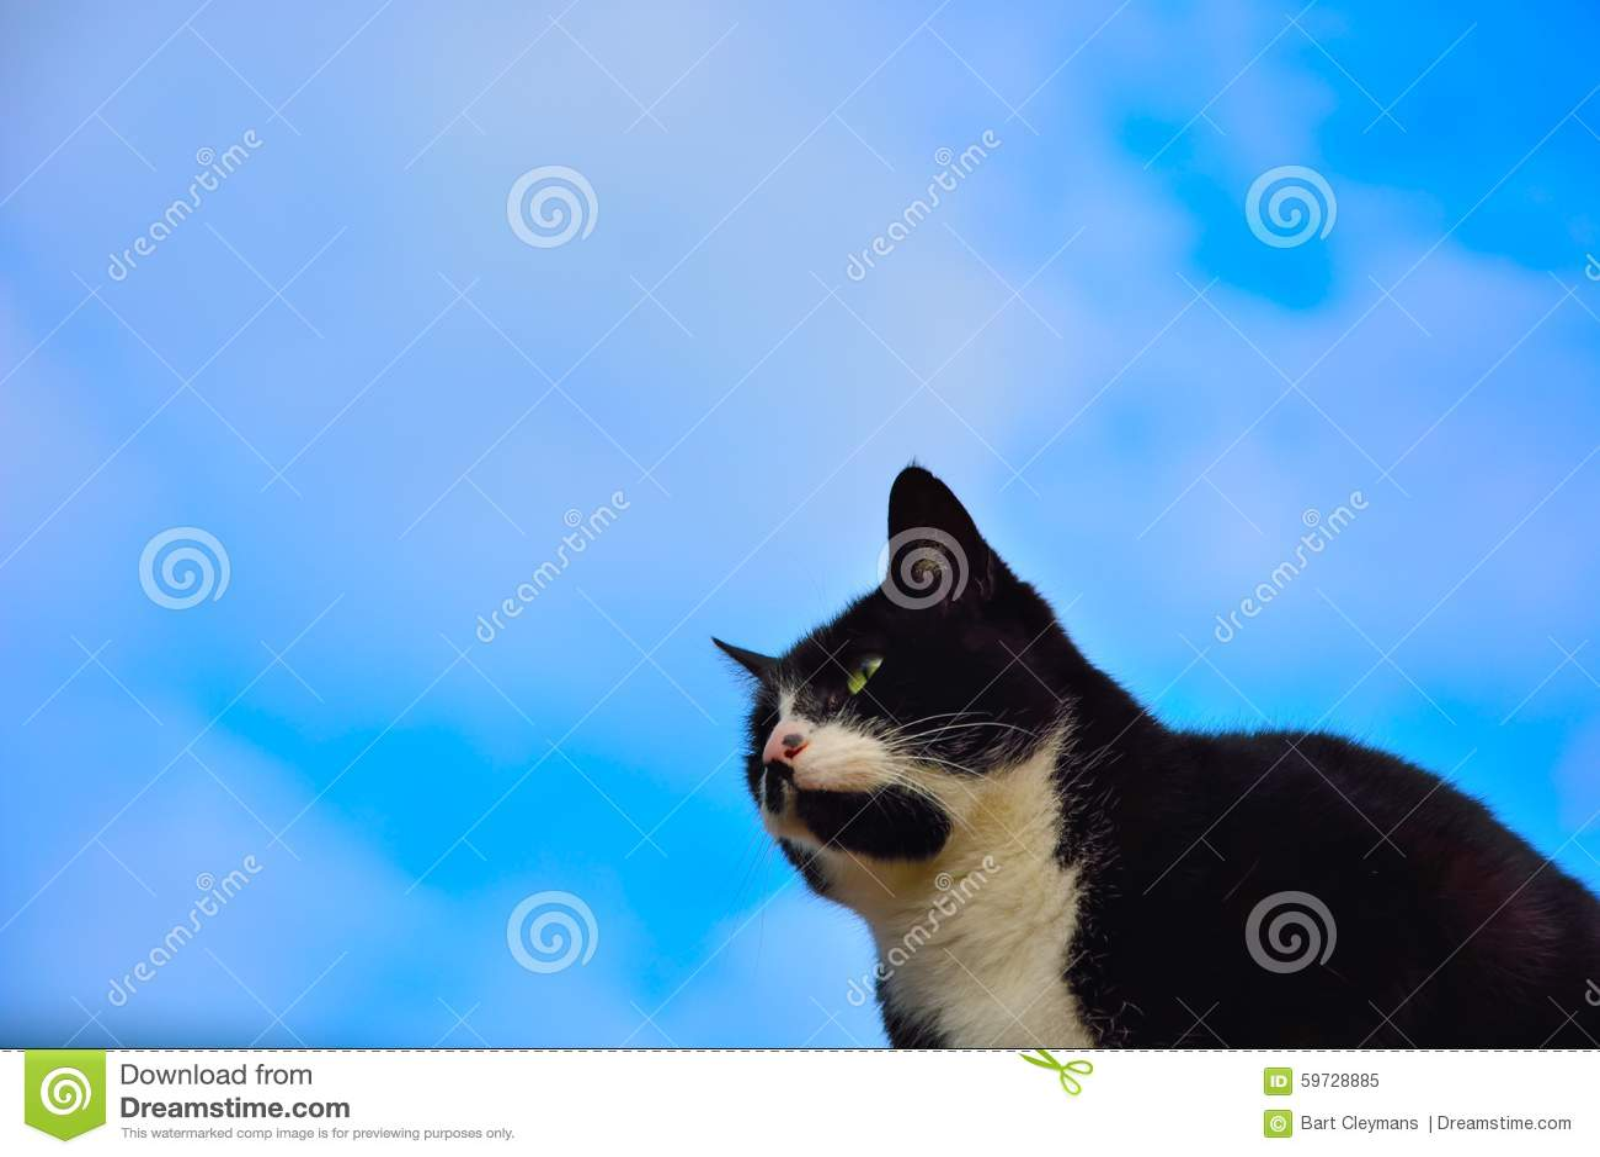 Black and white European house cat